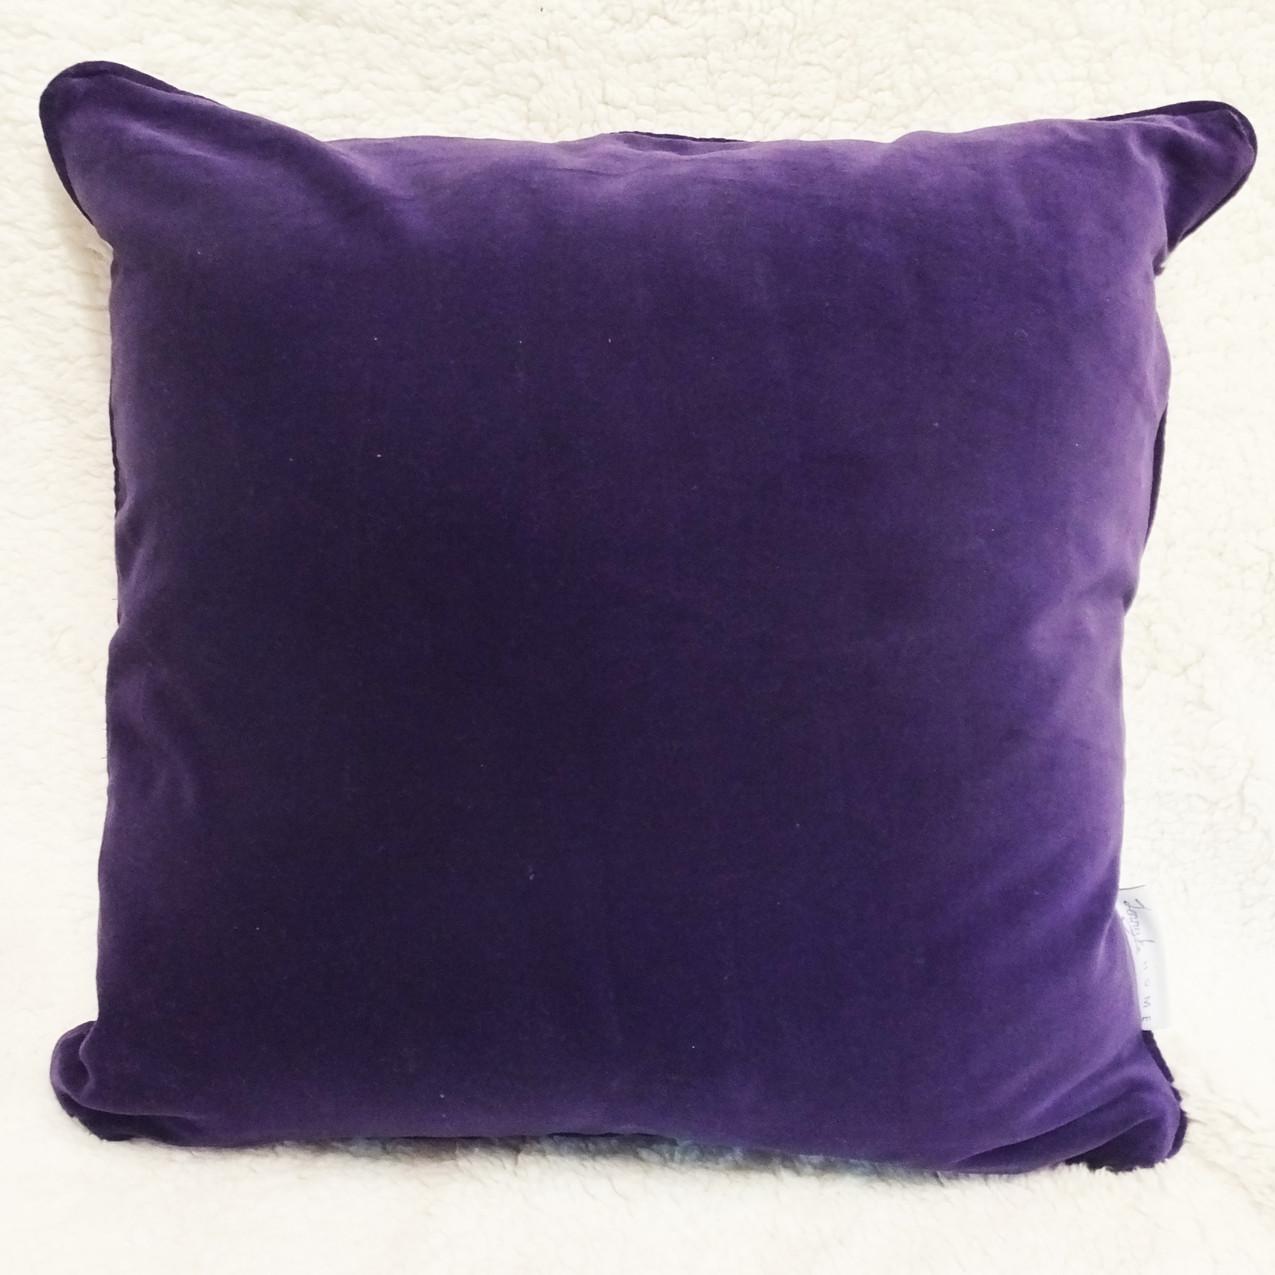 Jenny K Home Aviary Group Budgie Bird Cushion Purple Velvet Piping Cotton 2